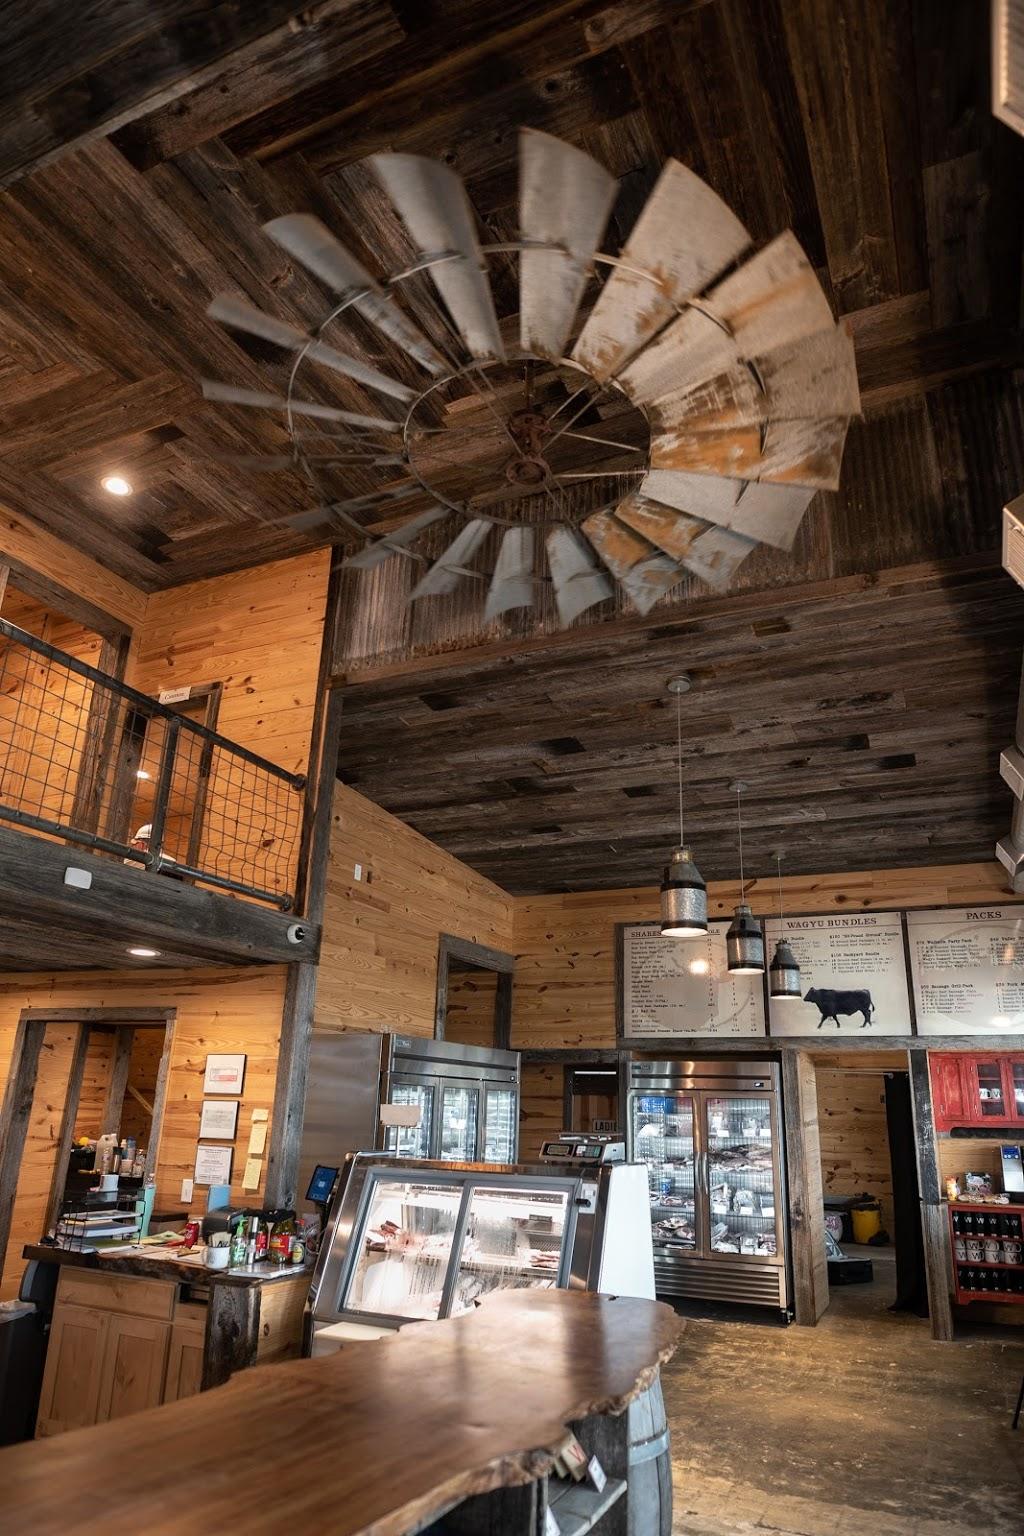 Walhalla Valley Smokehouse & Market - store  | Photo 5 of 5 | Address: 4315 E, TX-71, La Grange, TX 78945, USA | Phone: (979) 249-2571